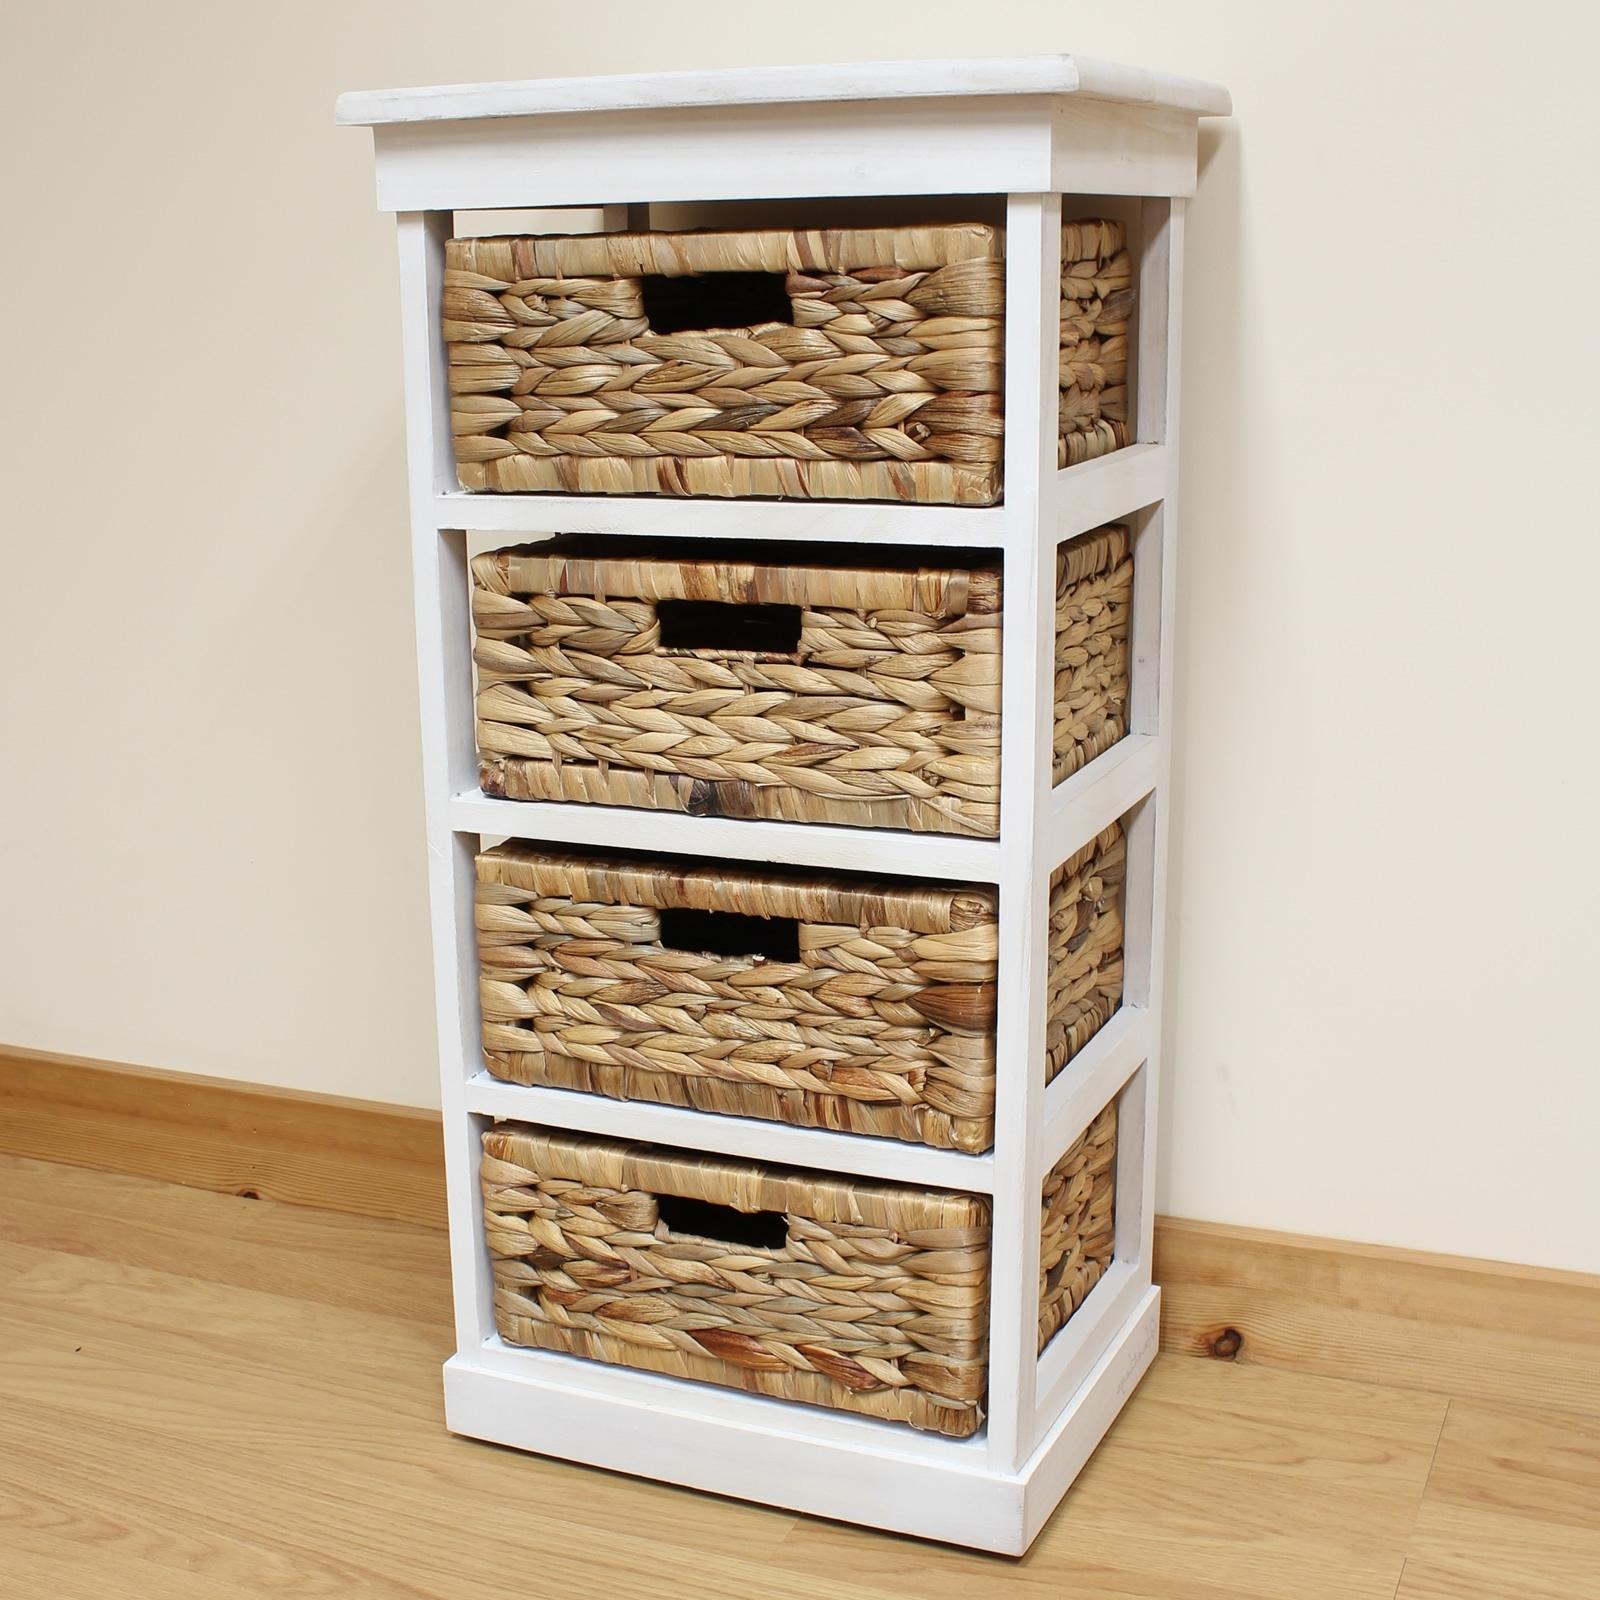 36 Storage Bins For Bathroom Bathroom Laundry Storage Bins within measurements 1600 X 1600